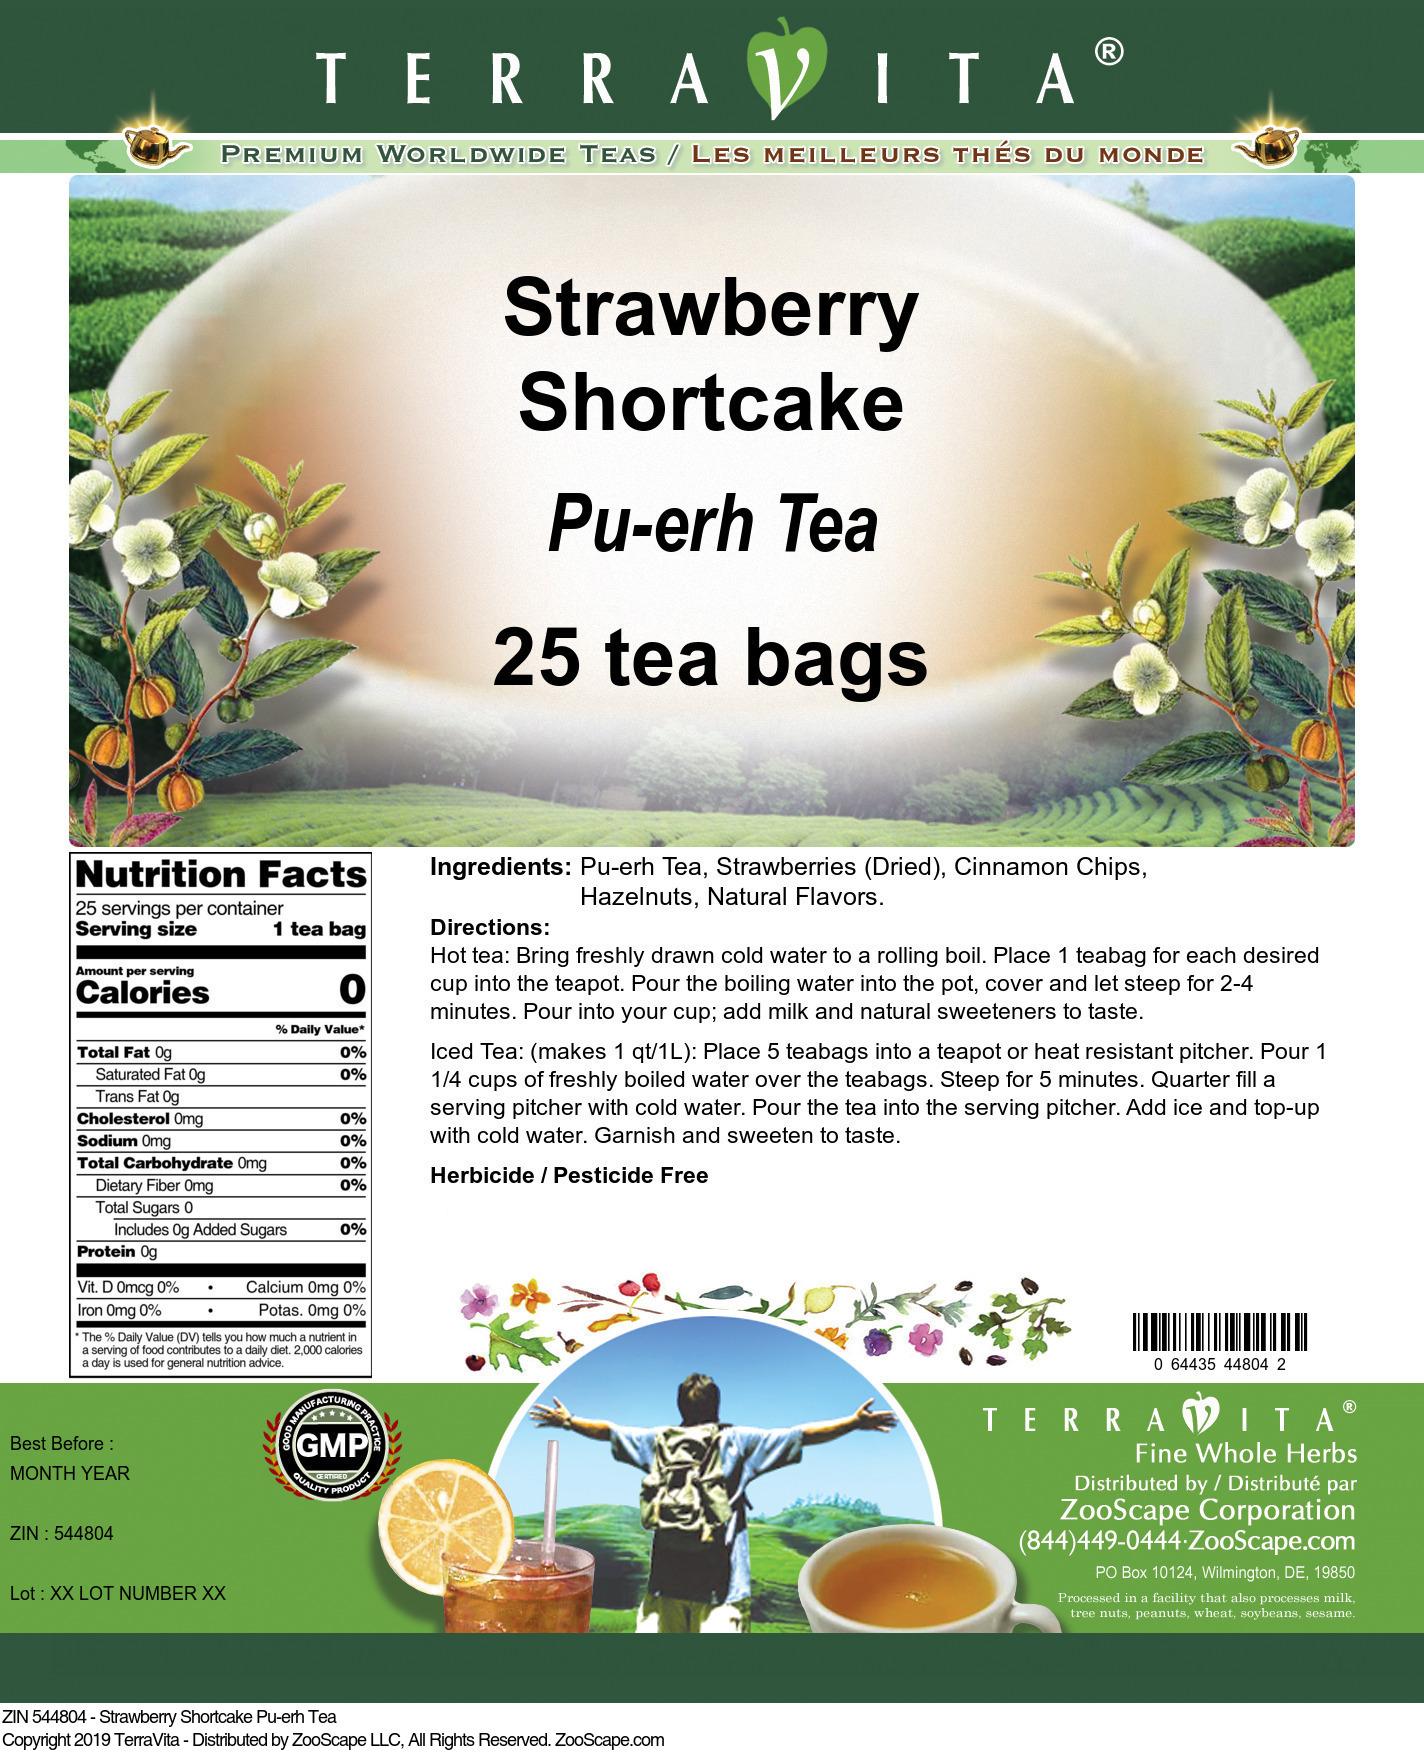 Strawberry Shortcake Pu-erh Tea